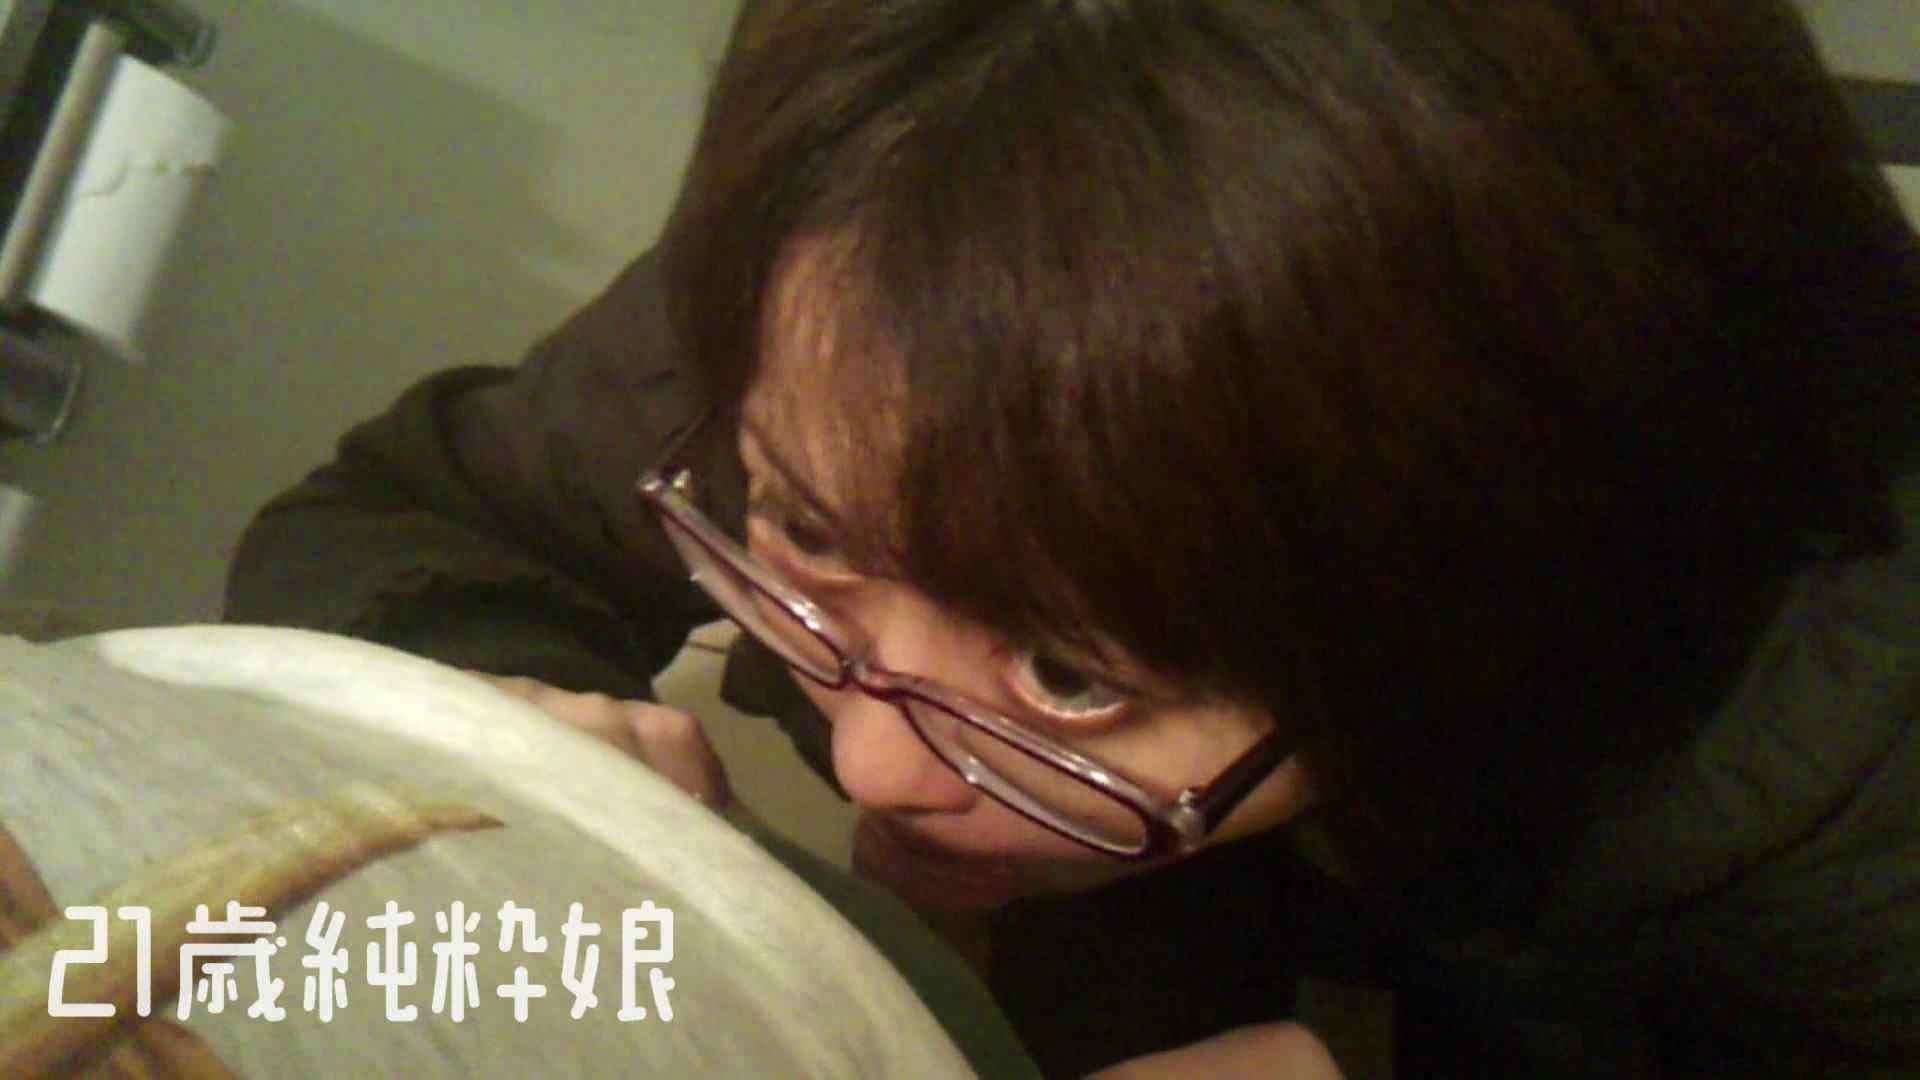 Gカップ21歳純粋嬢第2弾Vol.5 OLヌード天国  110PIX 38